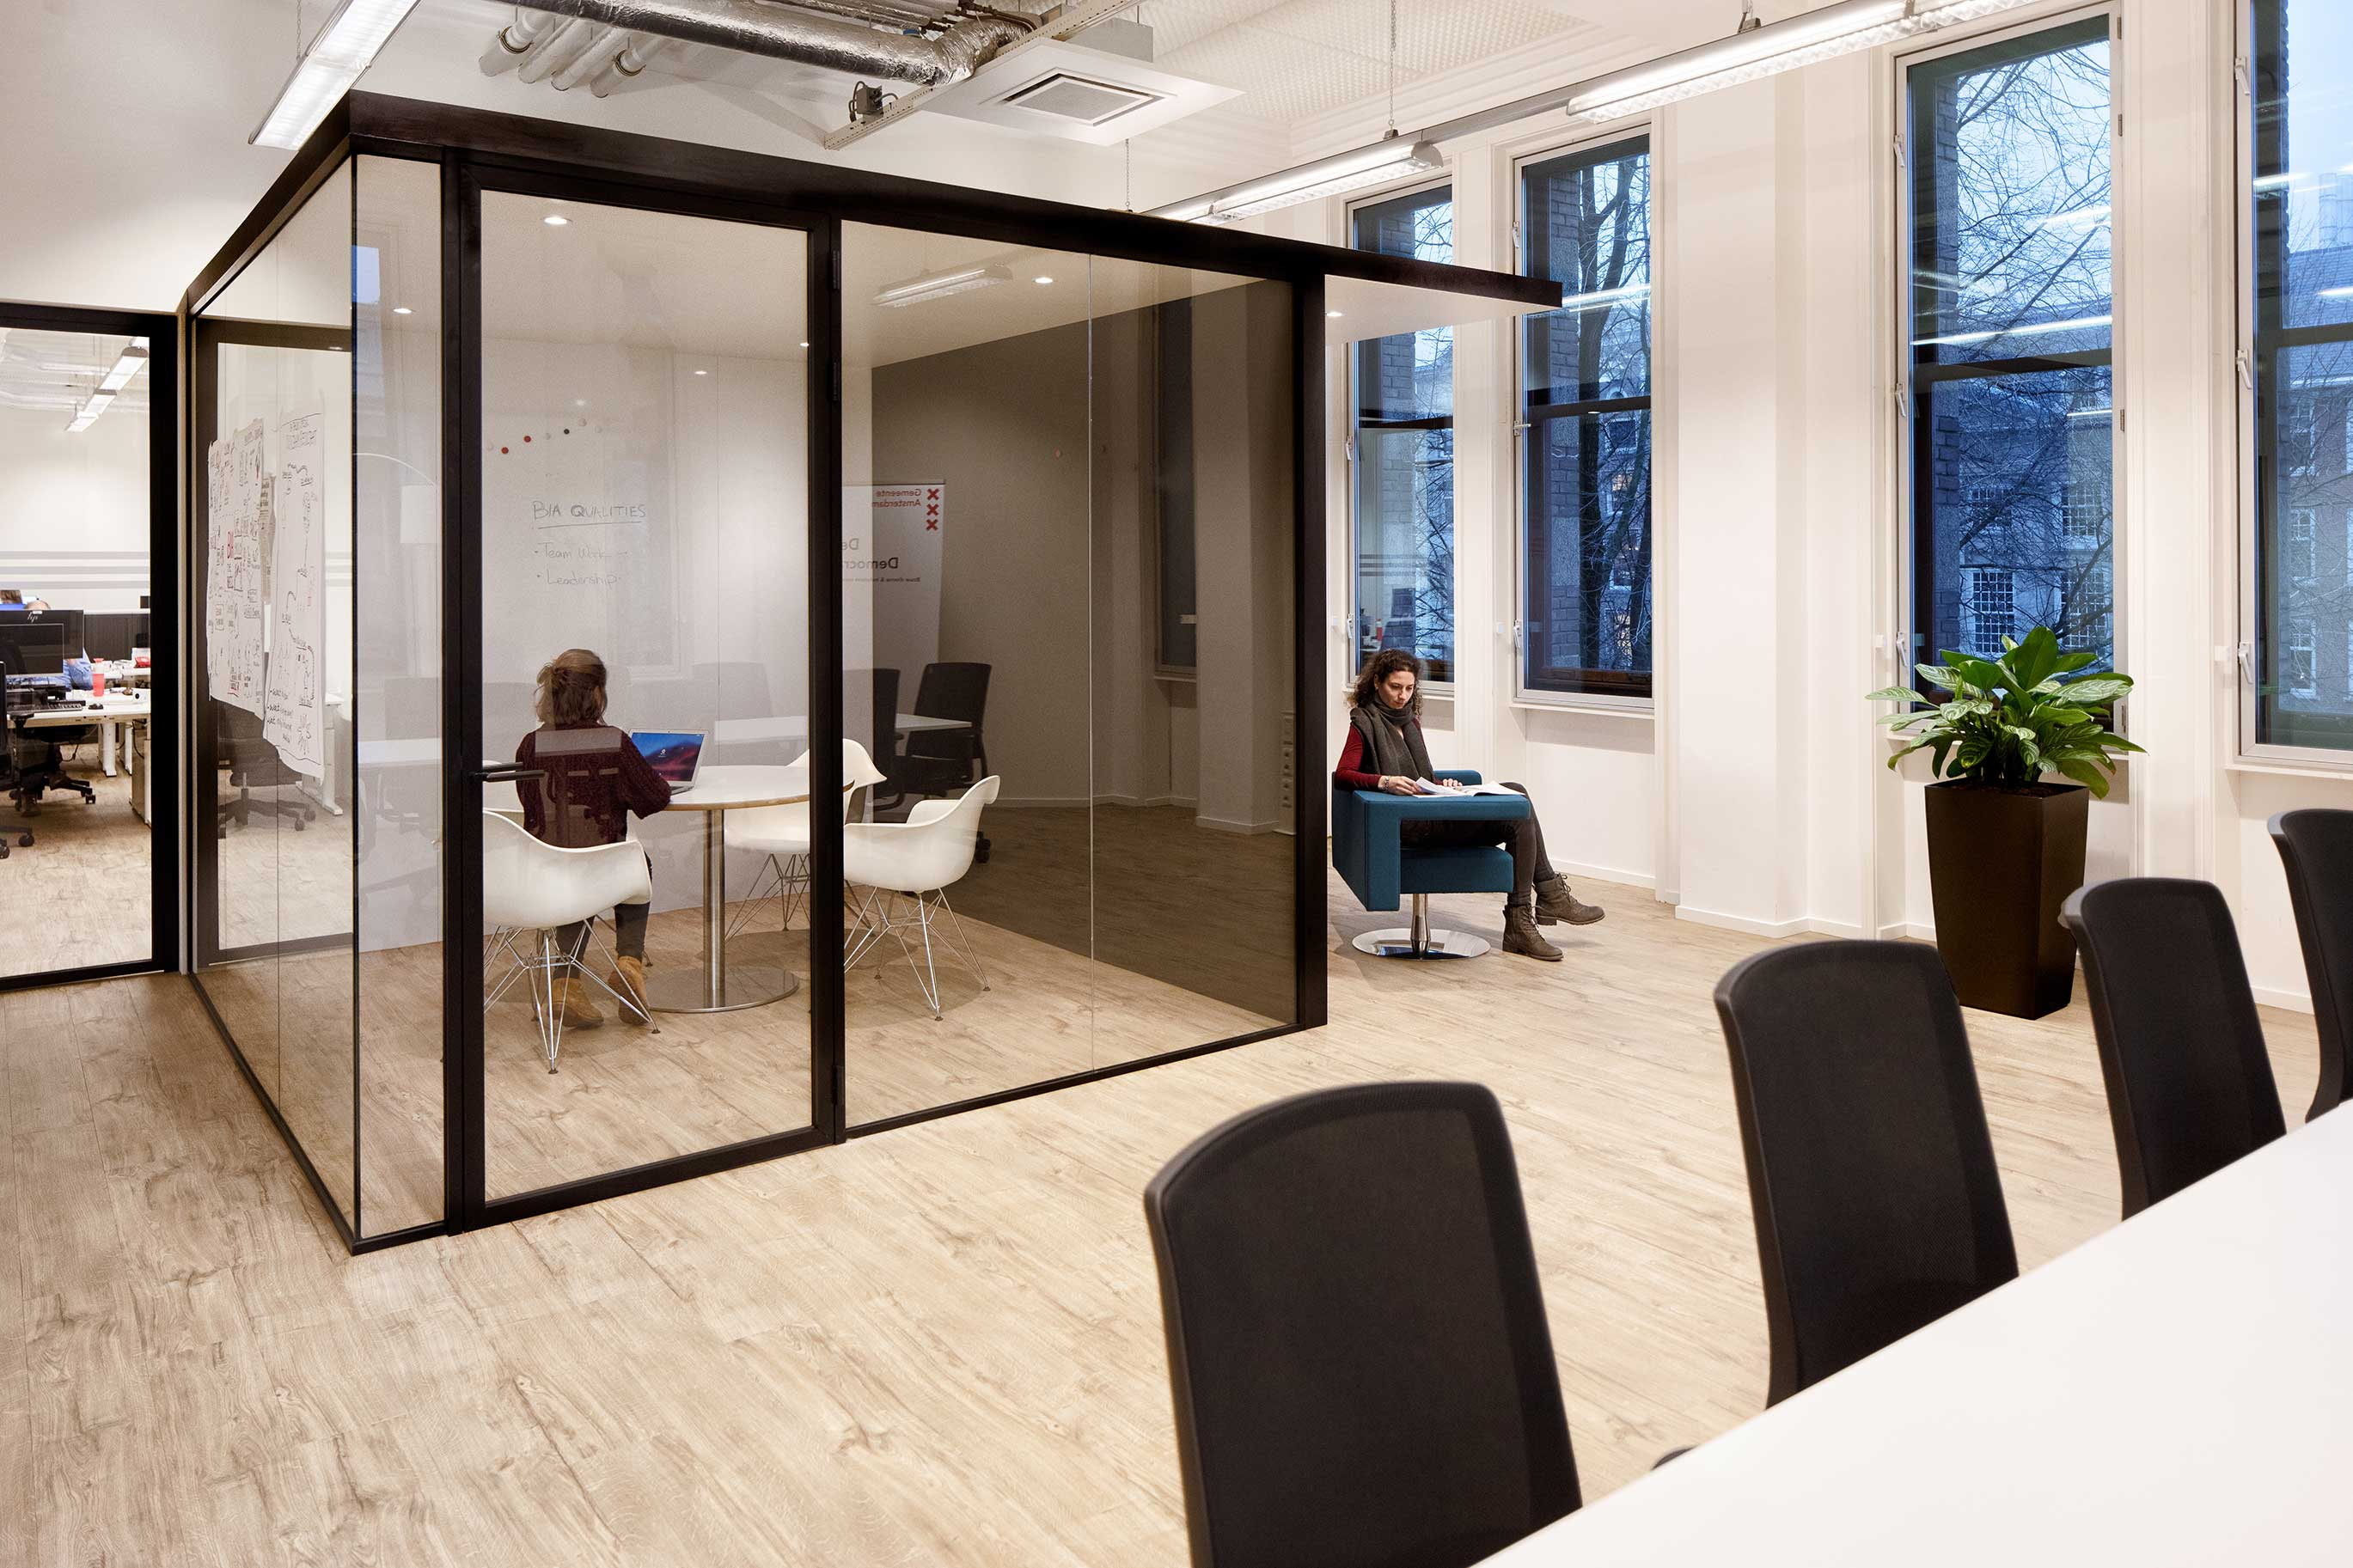 employe flexible private cube silent workstation room glassdoor buerau interim advies amsterdam